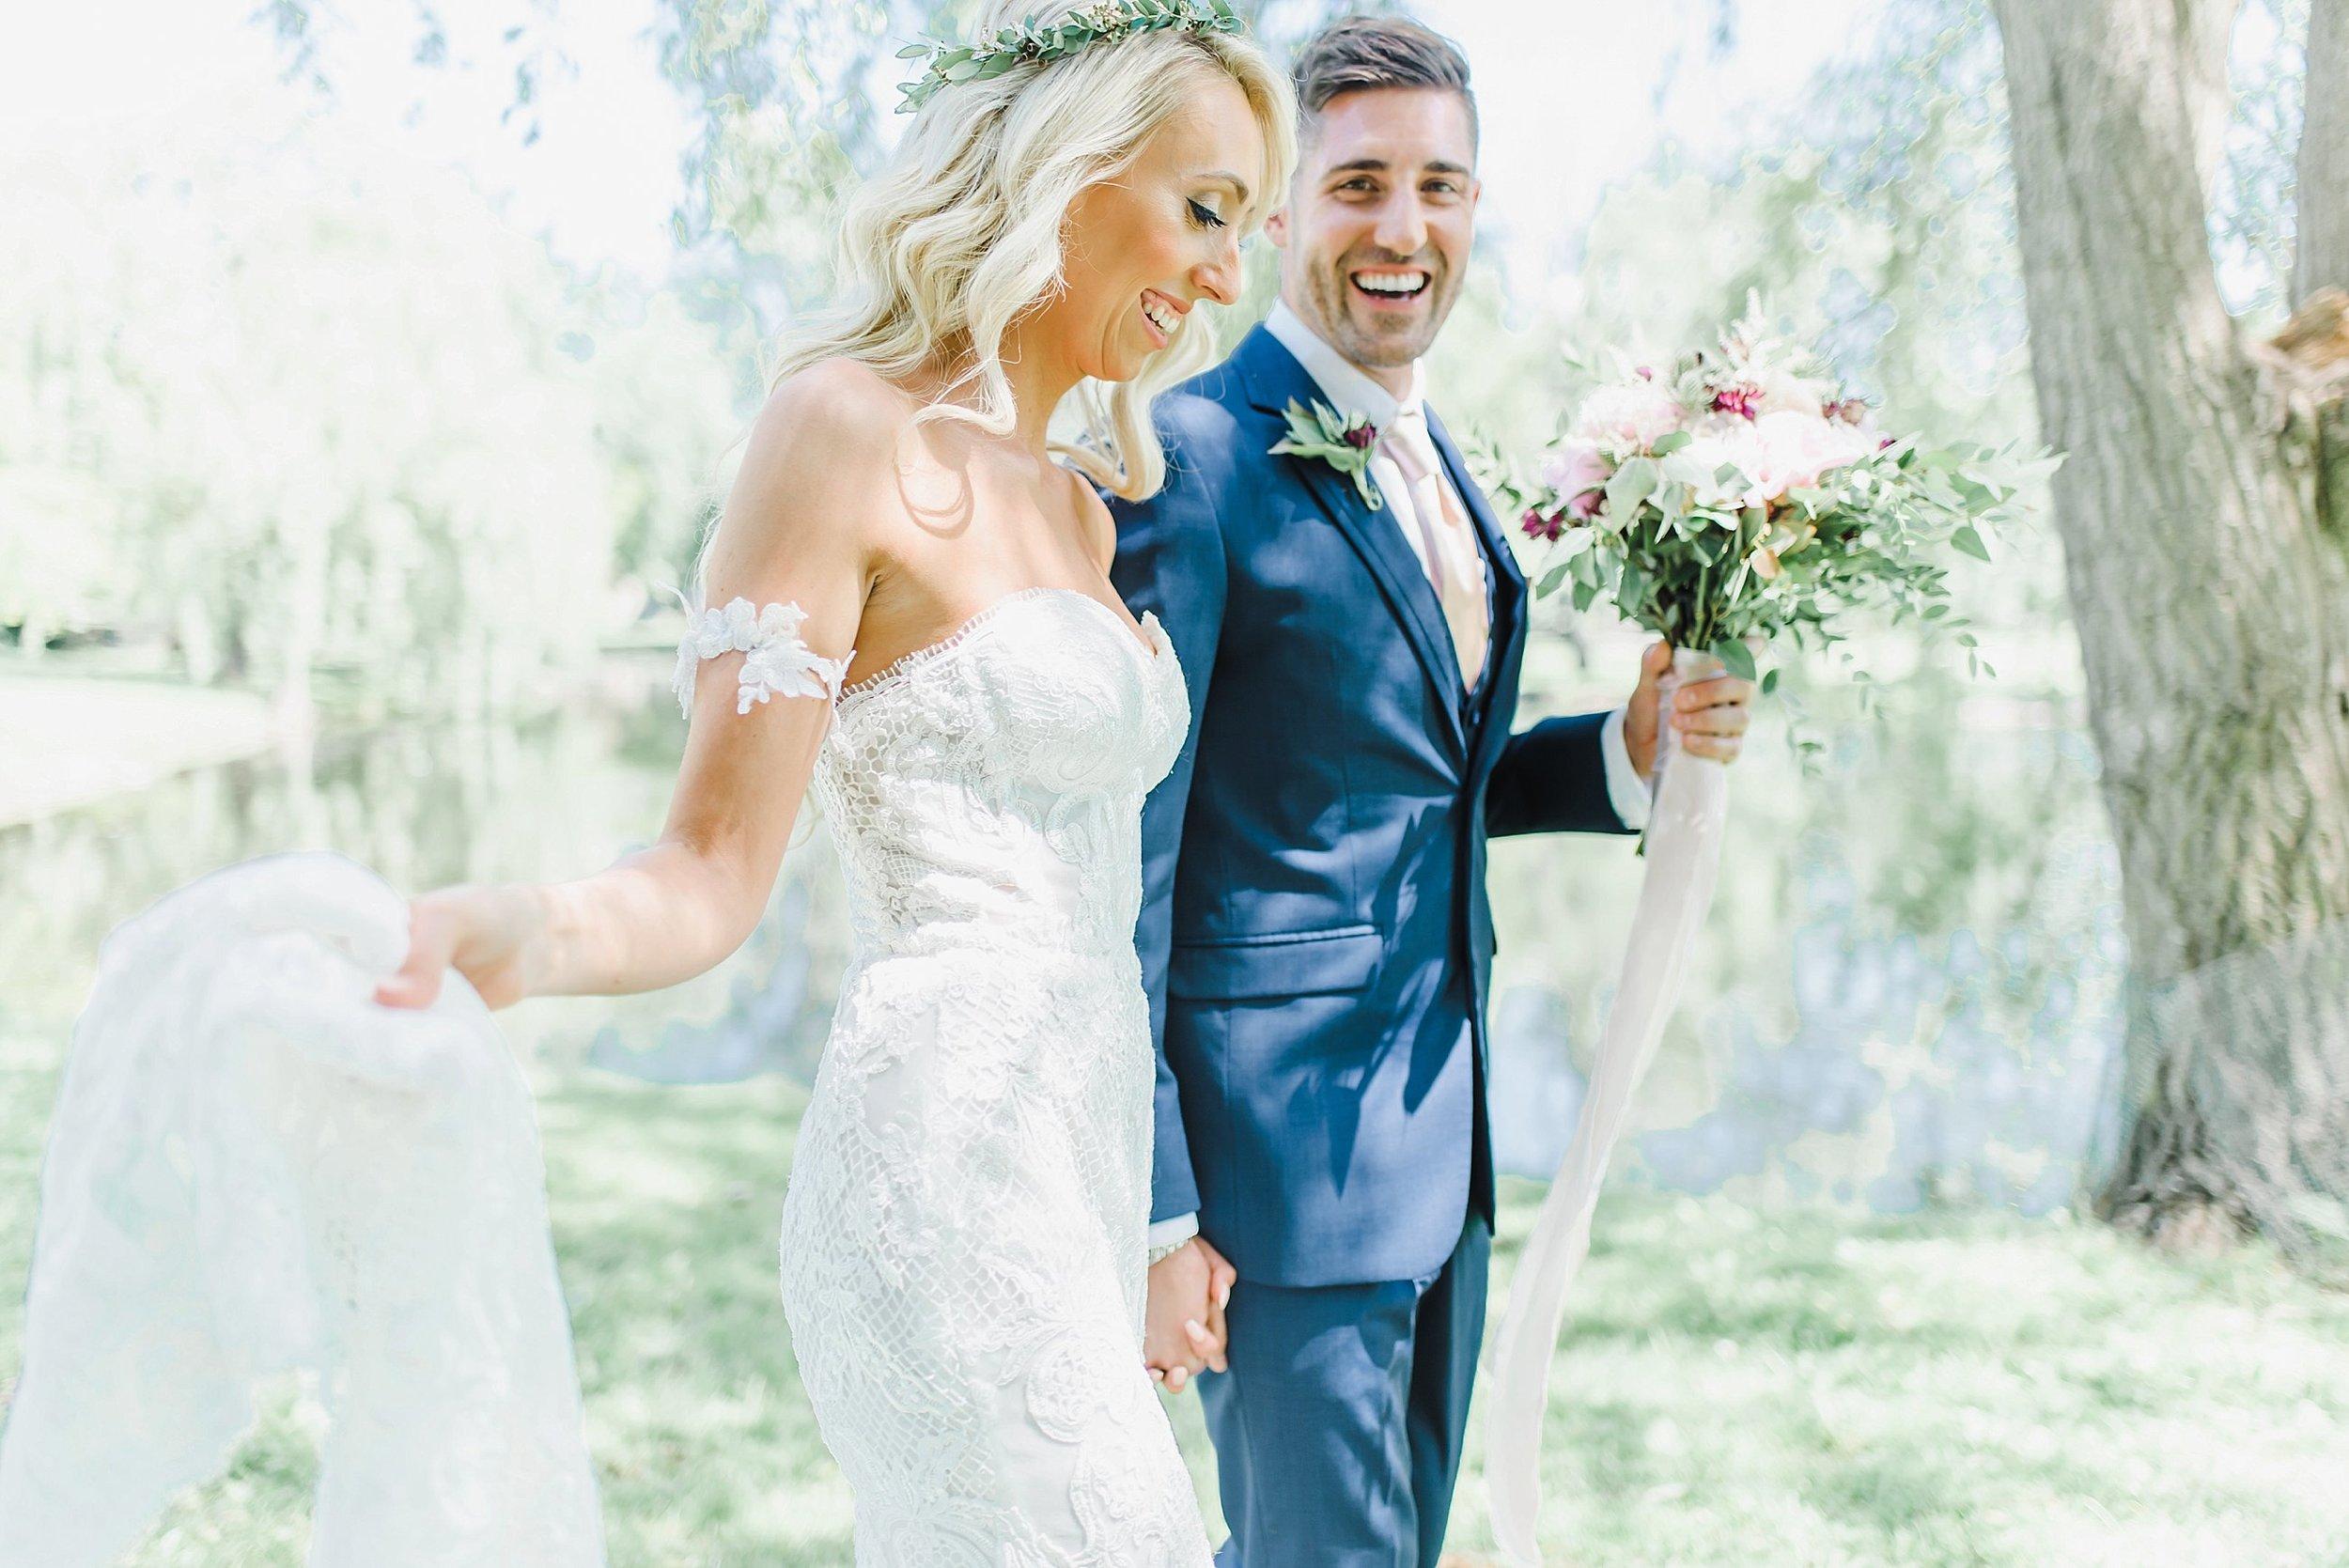 light airy indie fine art ottawa wedding photographer | Ali and Batoul Photography_0036.jpg